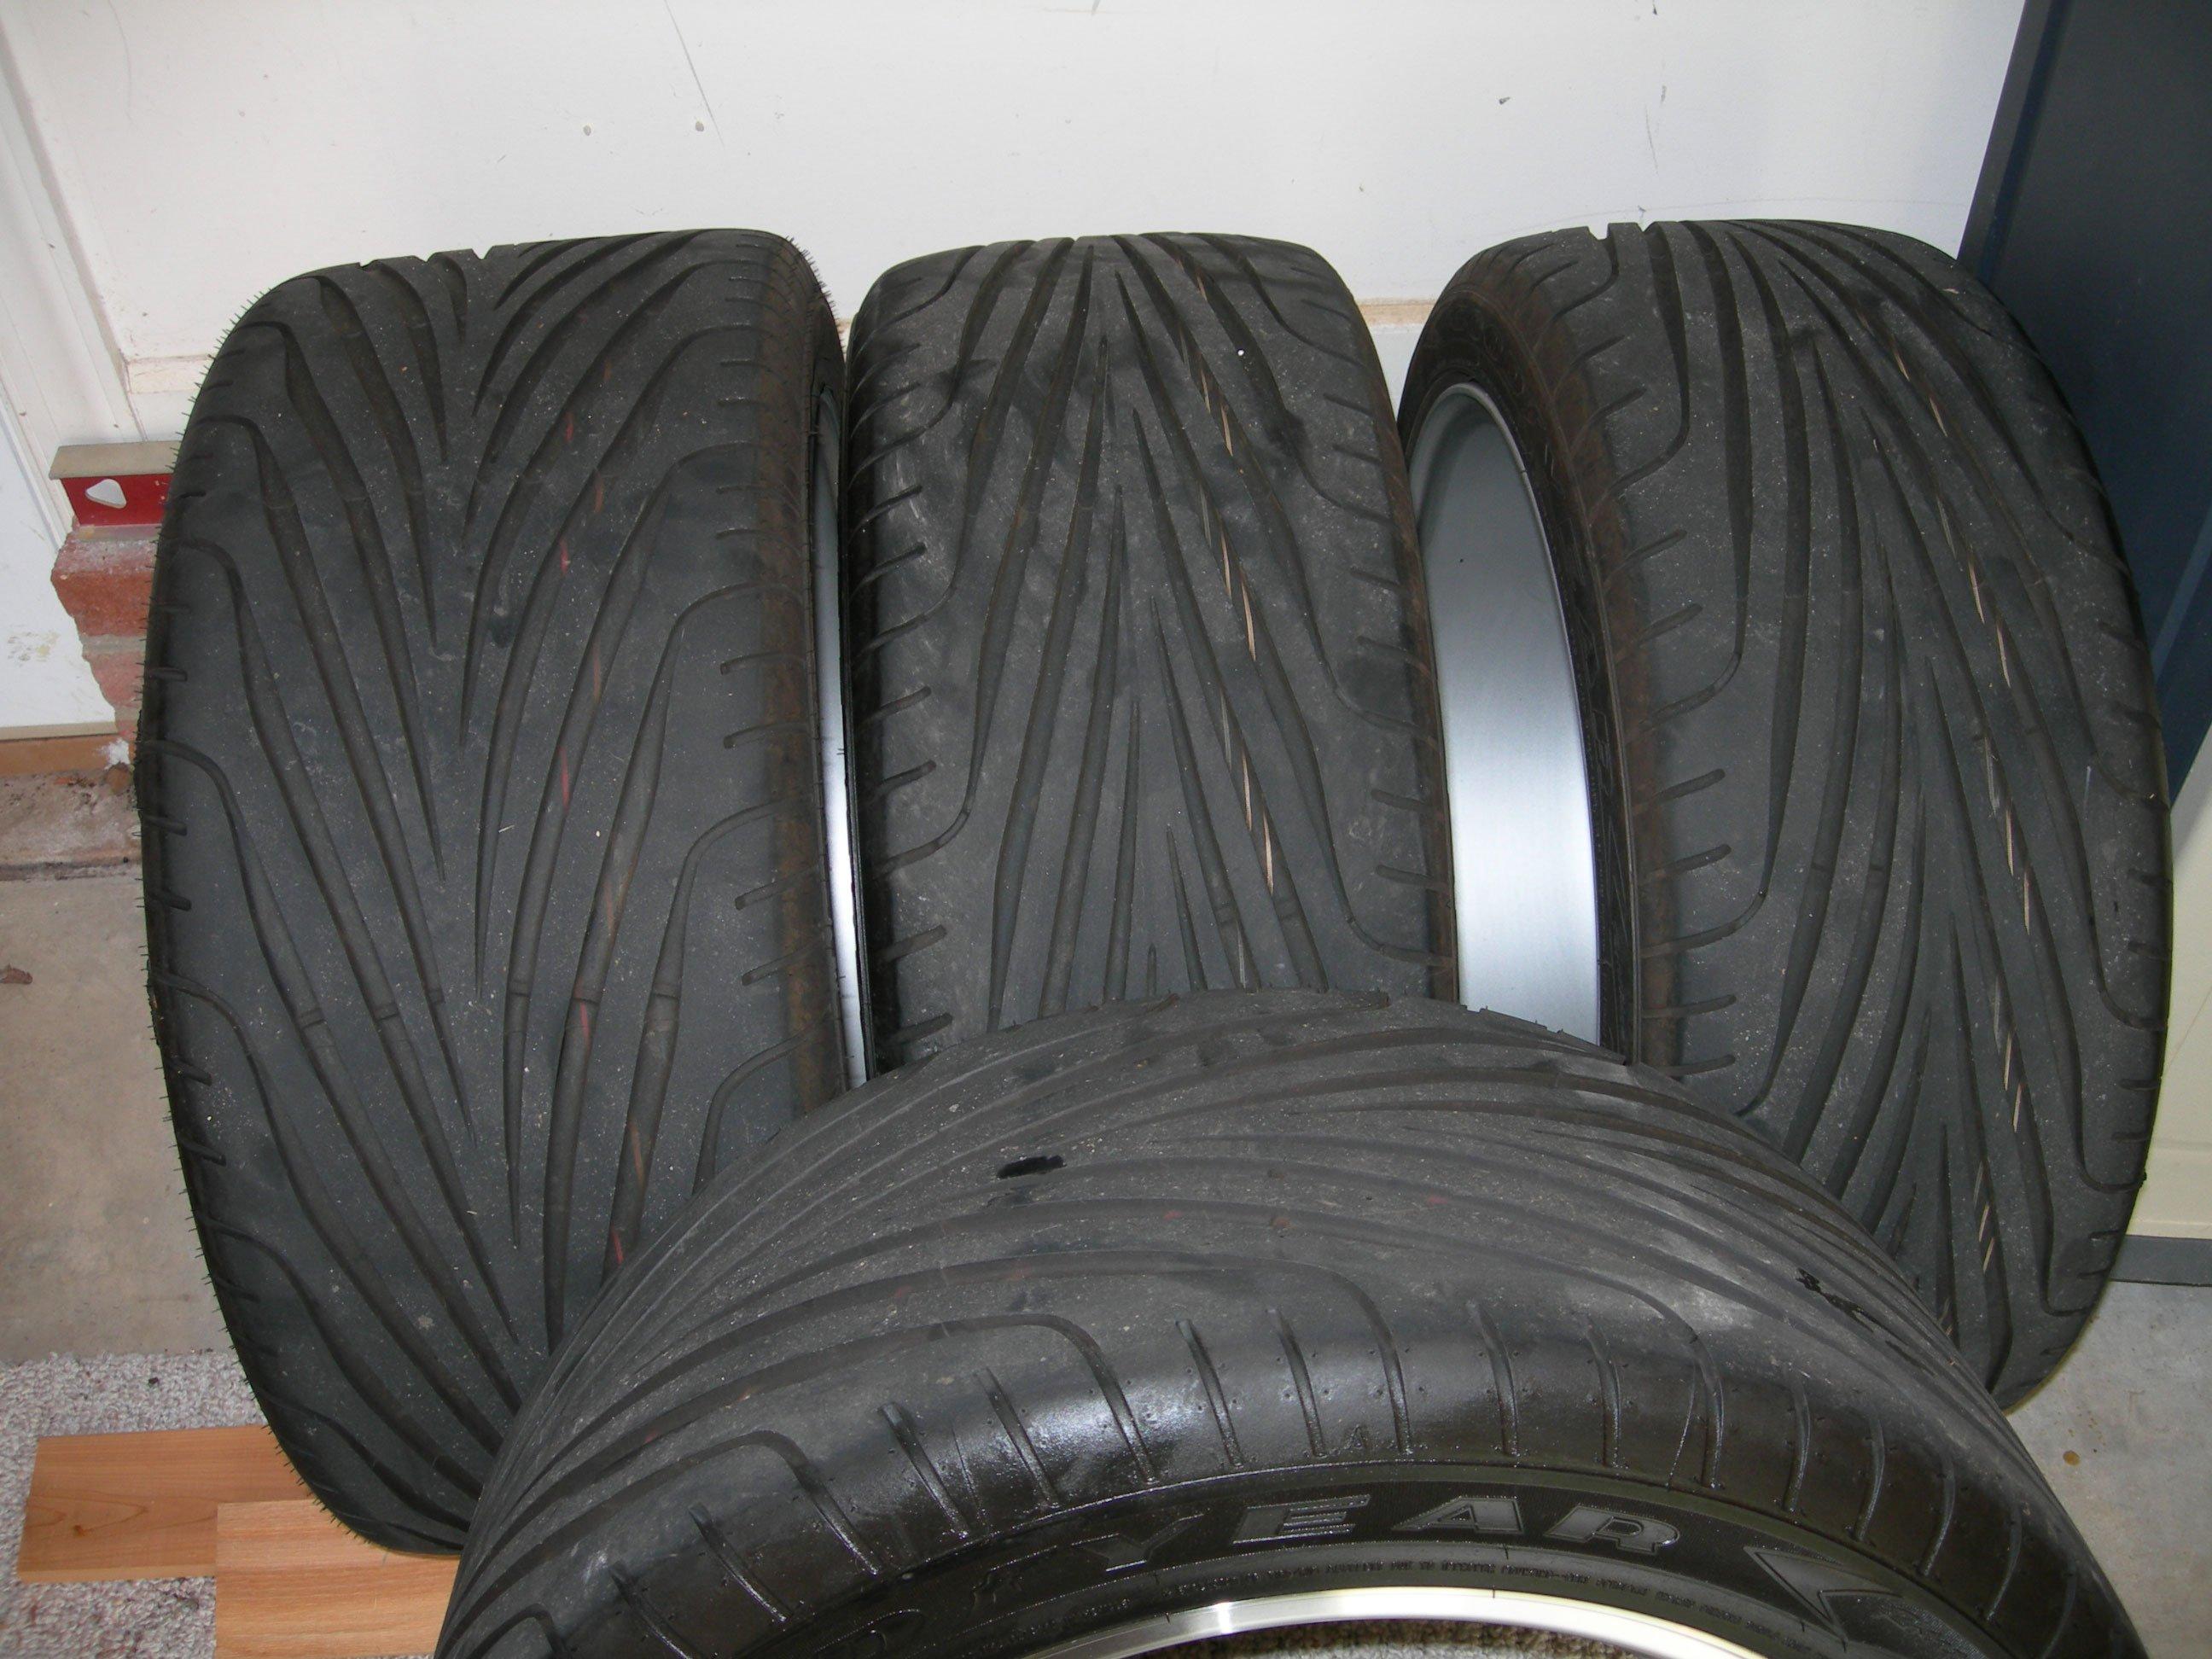 350z For Sale Near Me >> Nismo Wheels For Sale - Nissan 350Z Forum, Nissan 370Z